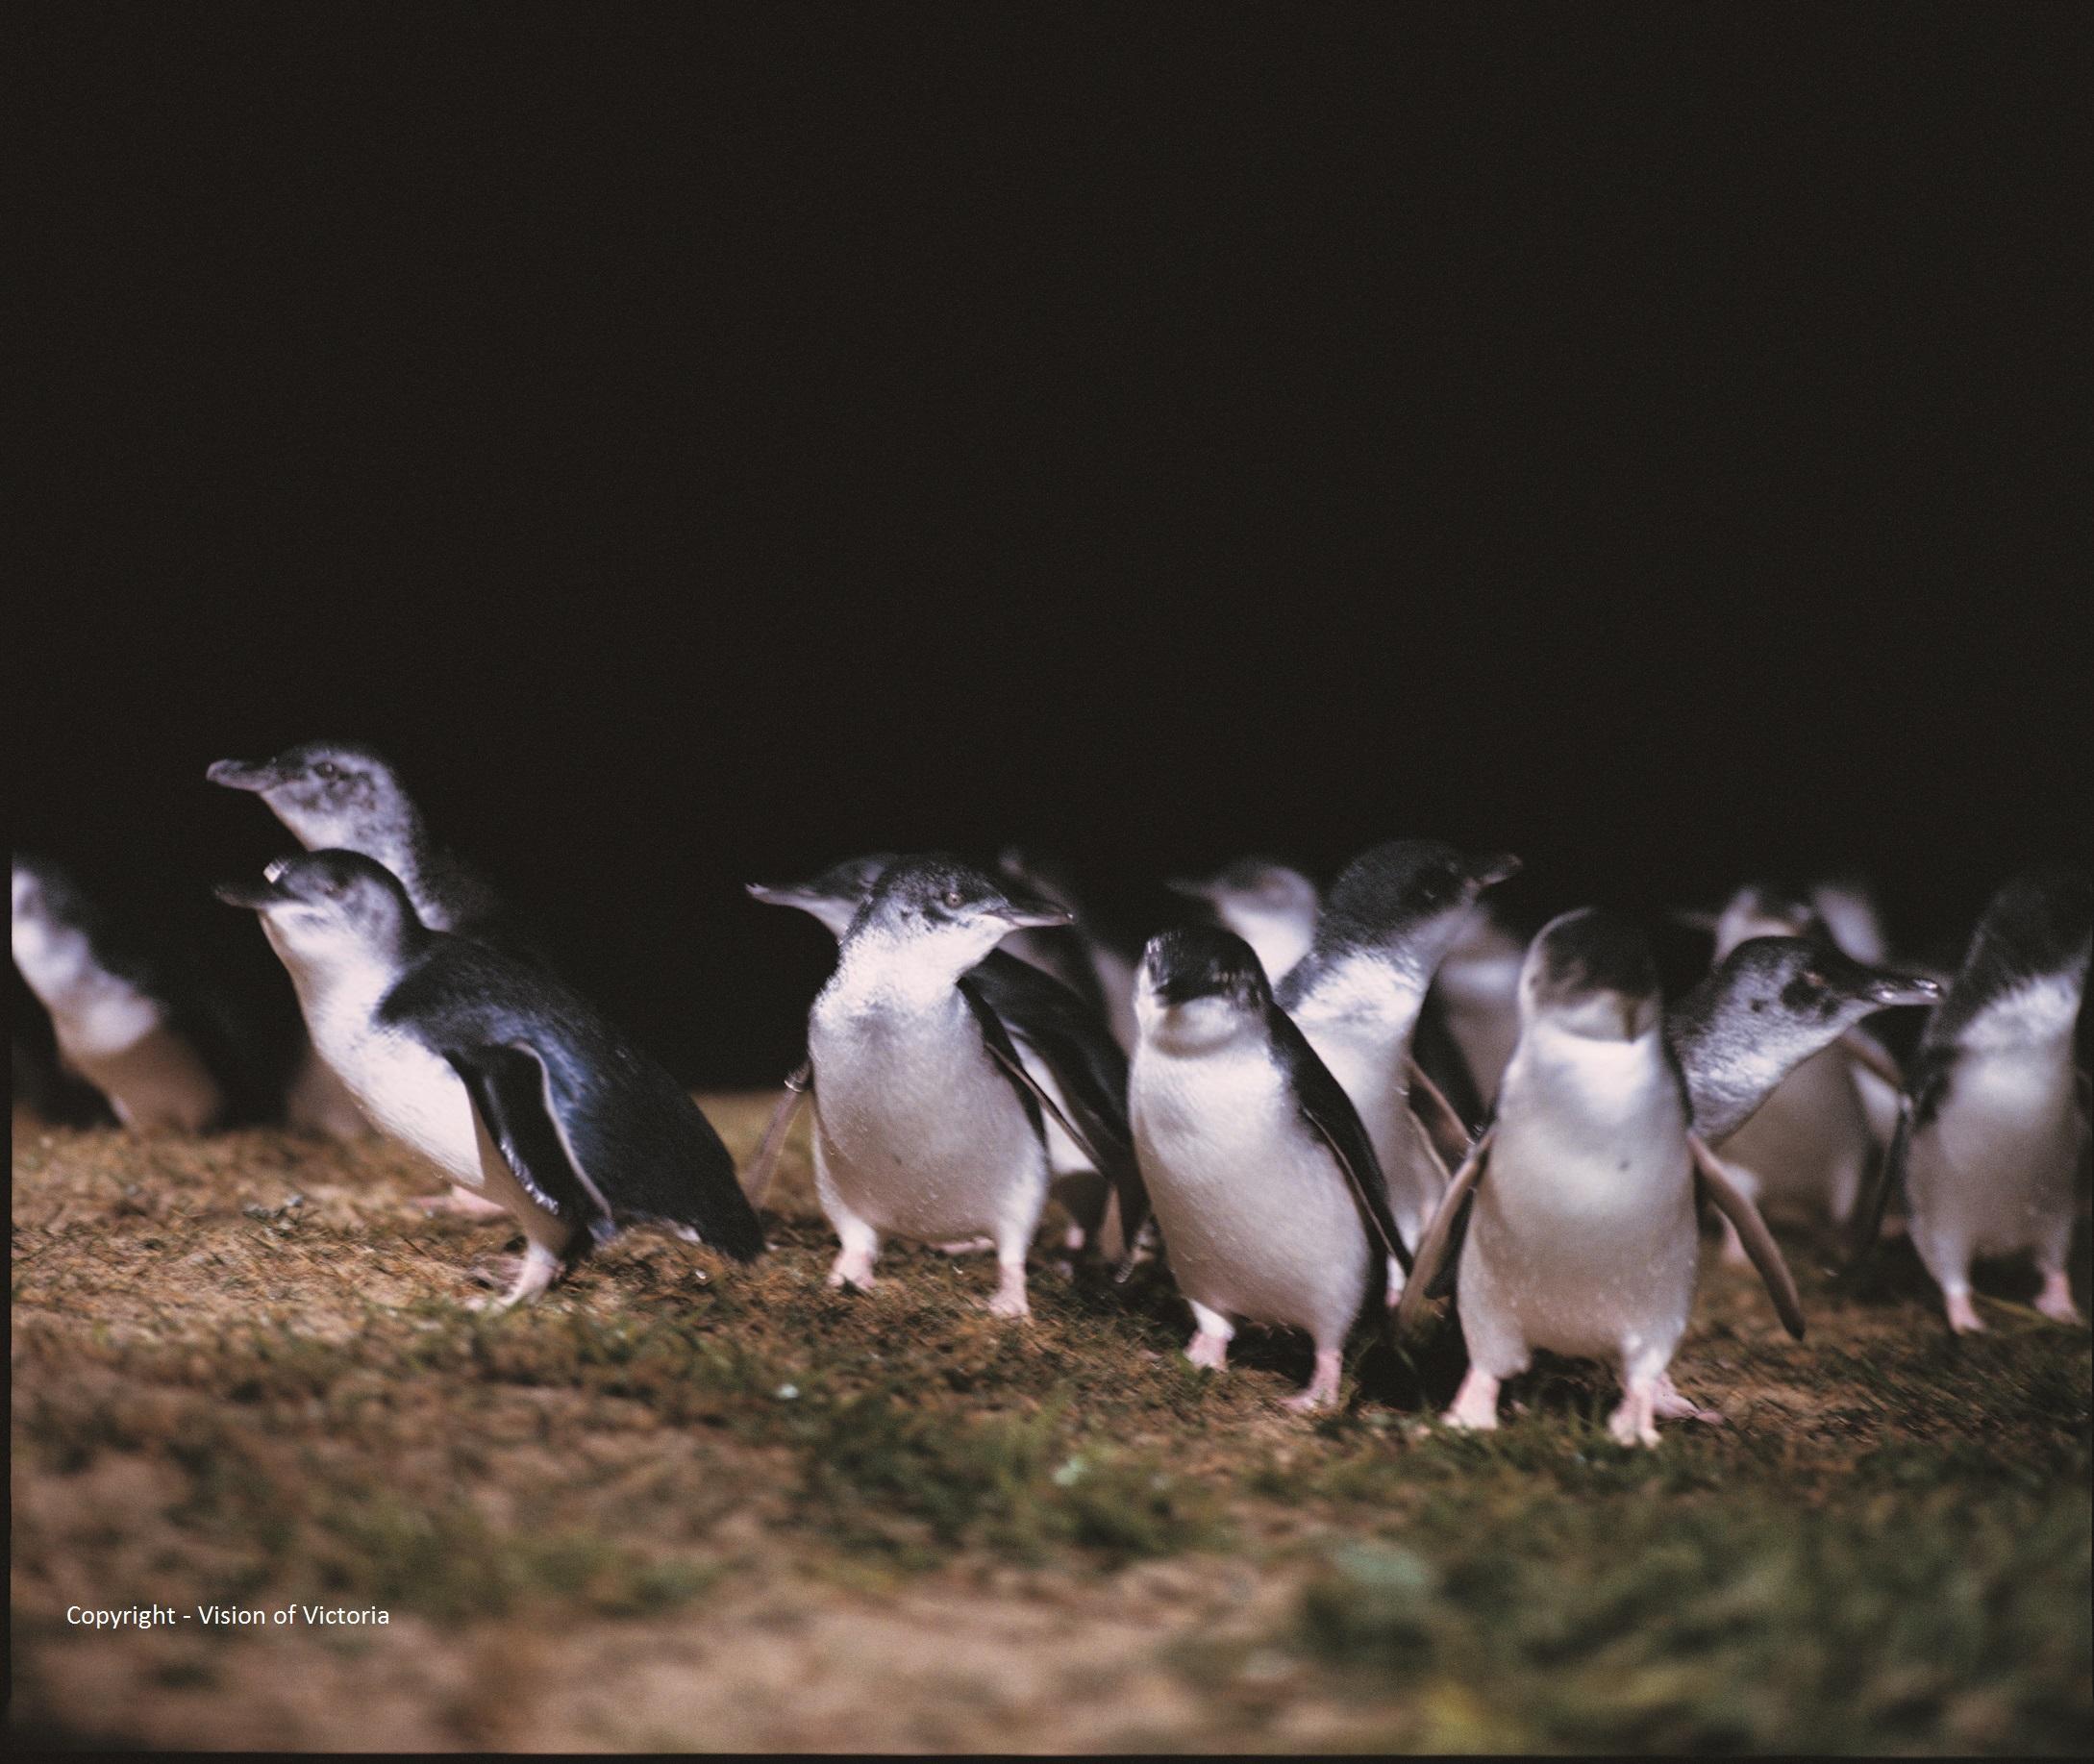 visionsofvictoria1057701-304 Phillip Island Nature park.jpg